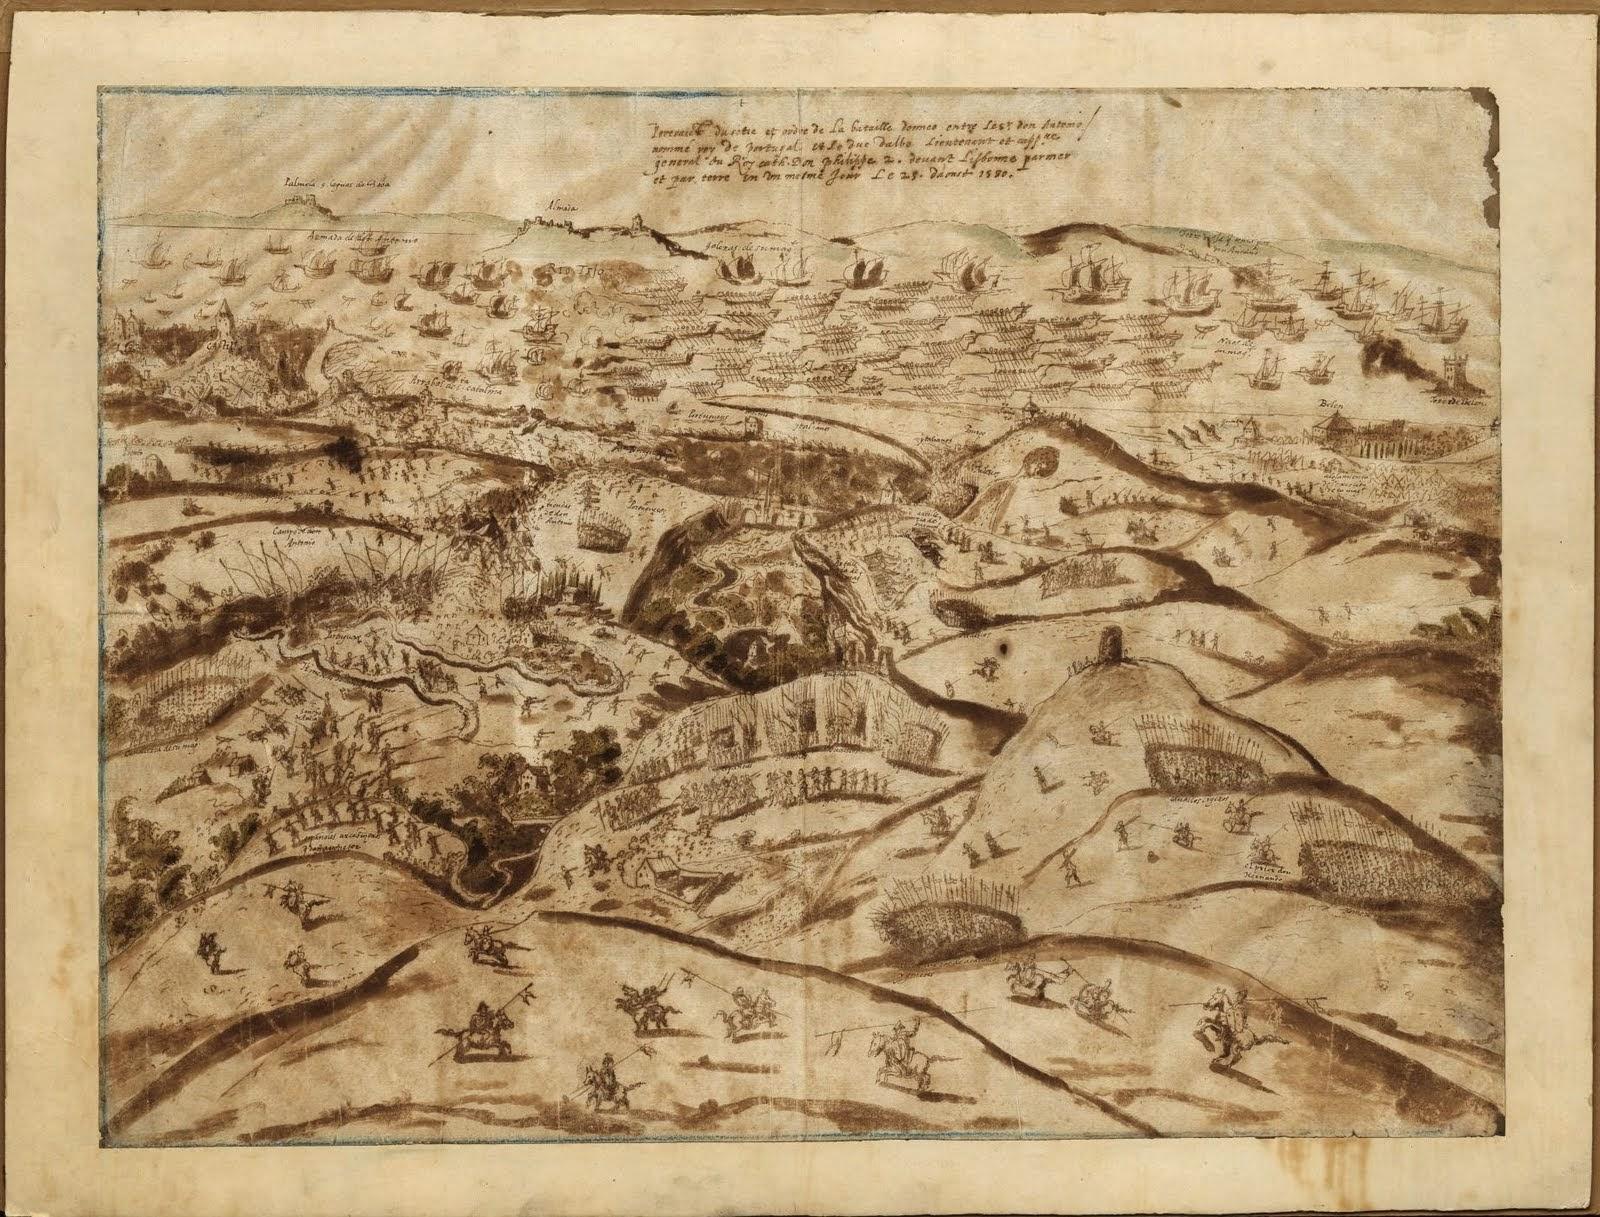 1580 Bataille d'Alcantara